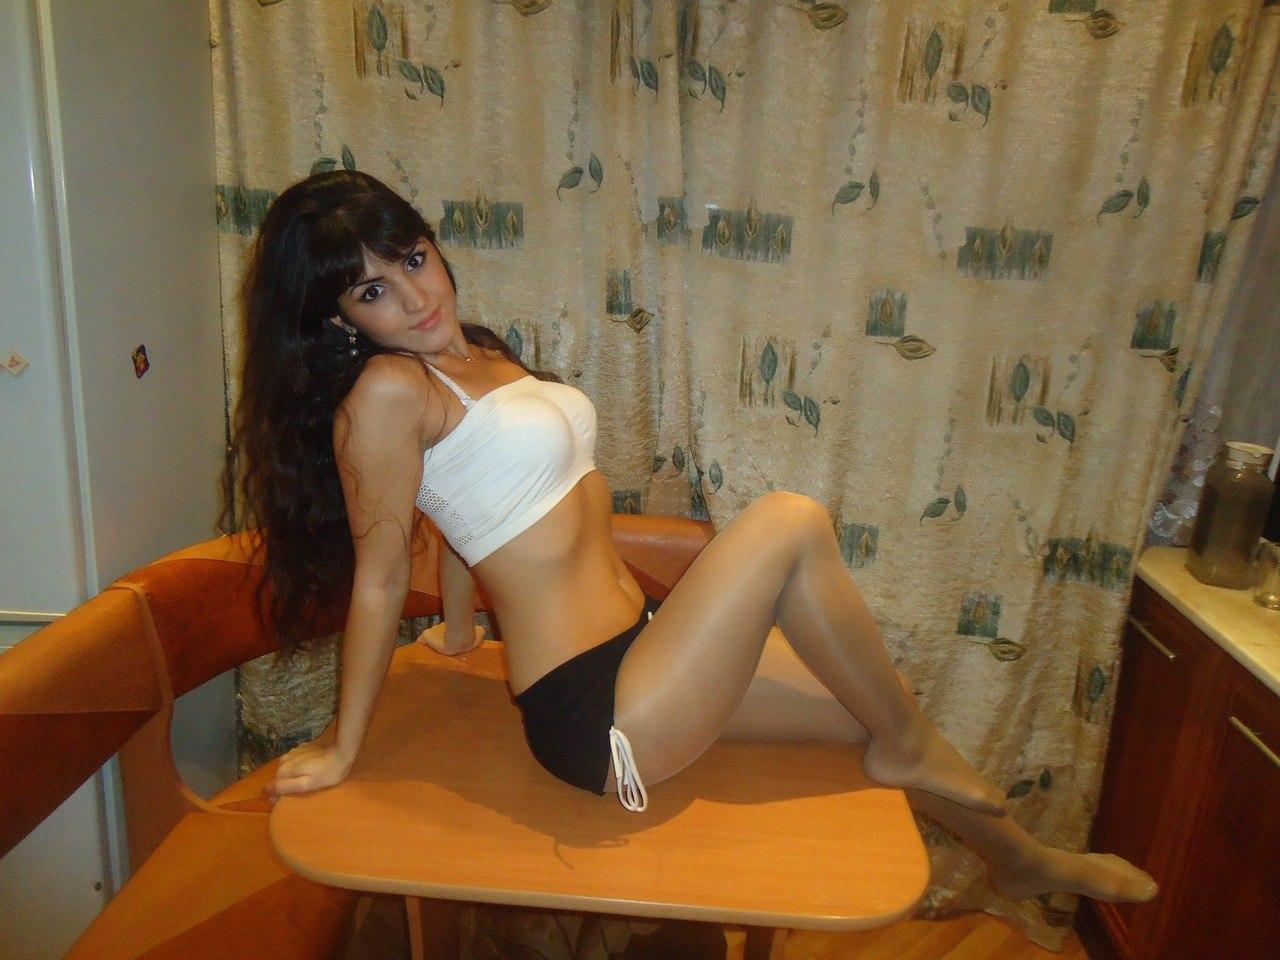 Порно фото павлодара